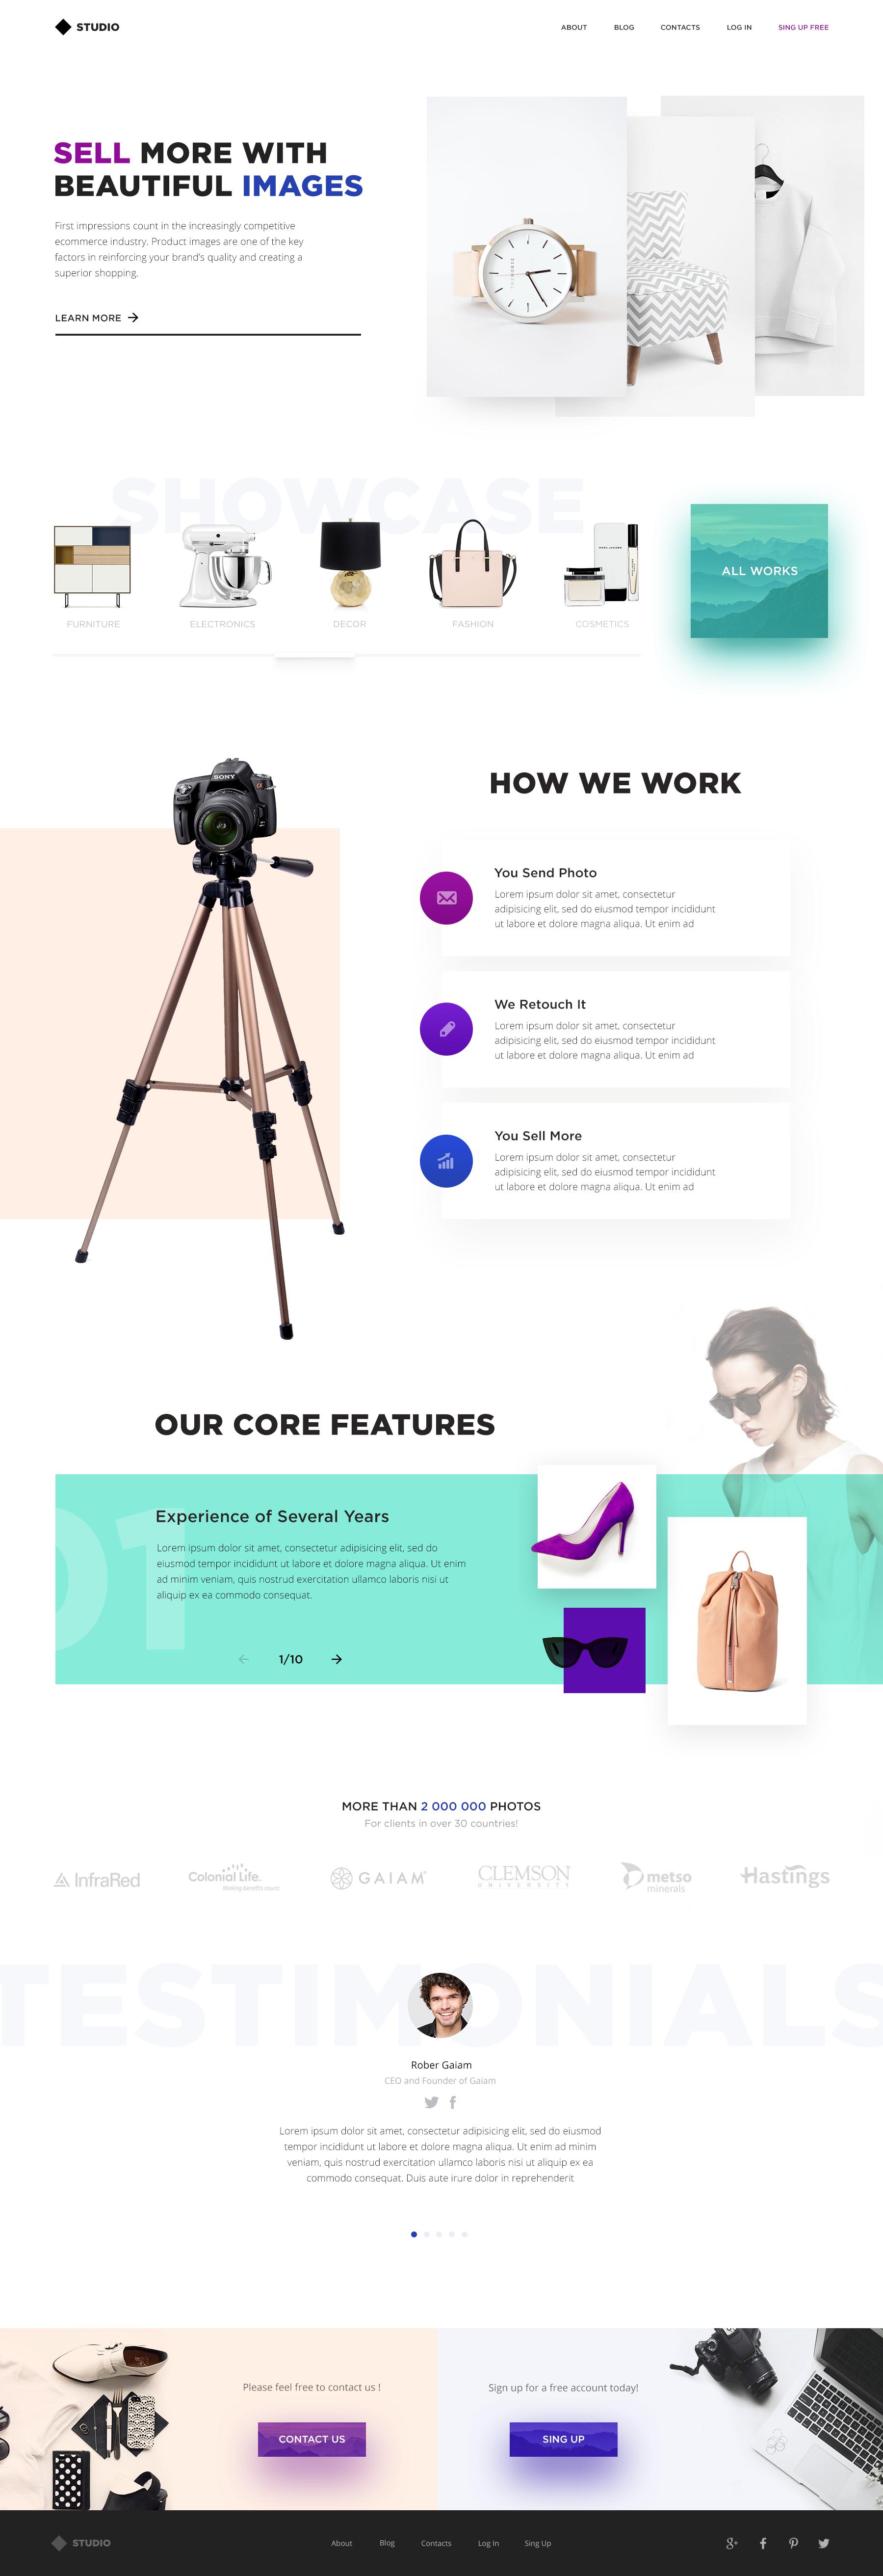 Tubik Studio UI/UX设计欣赏